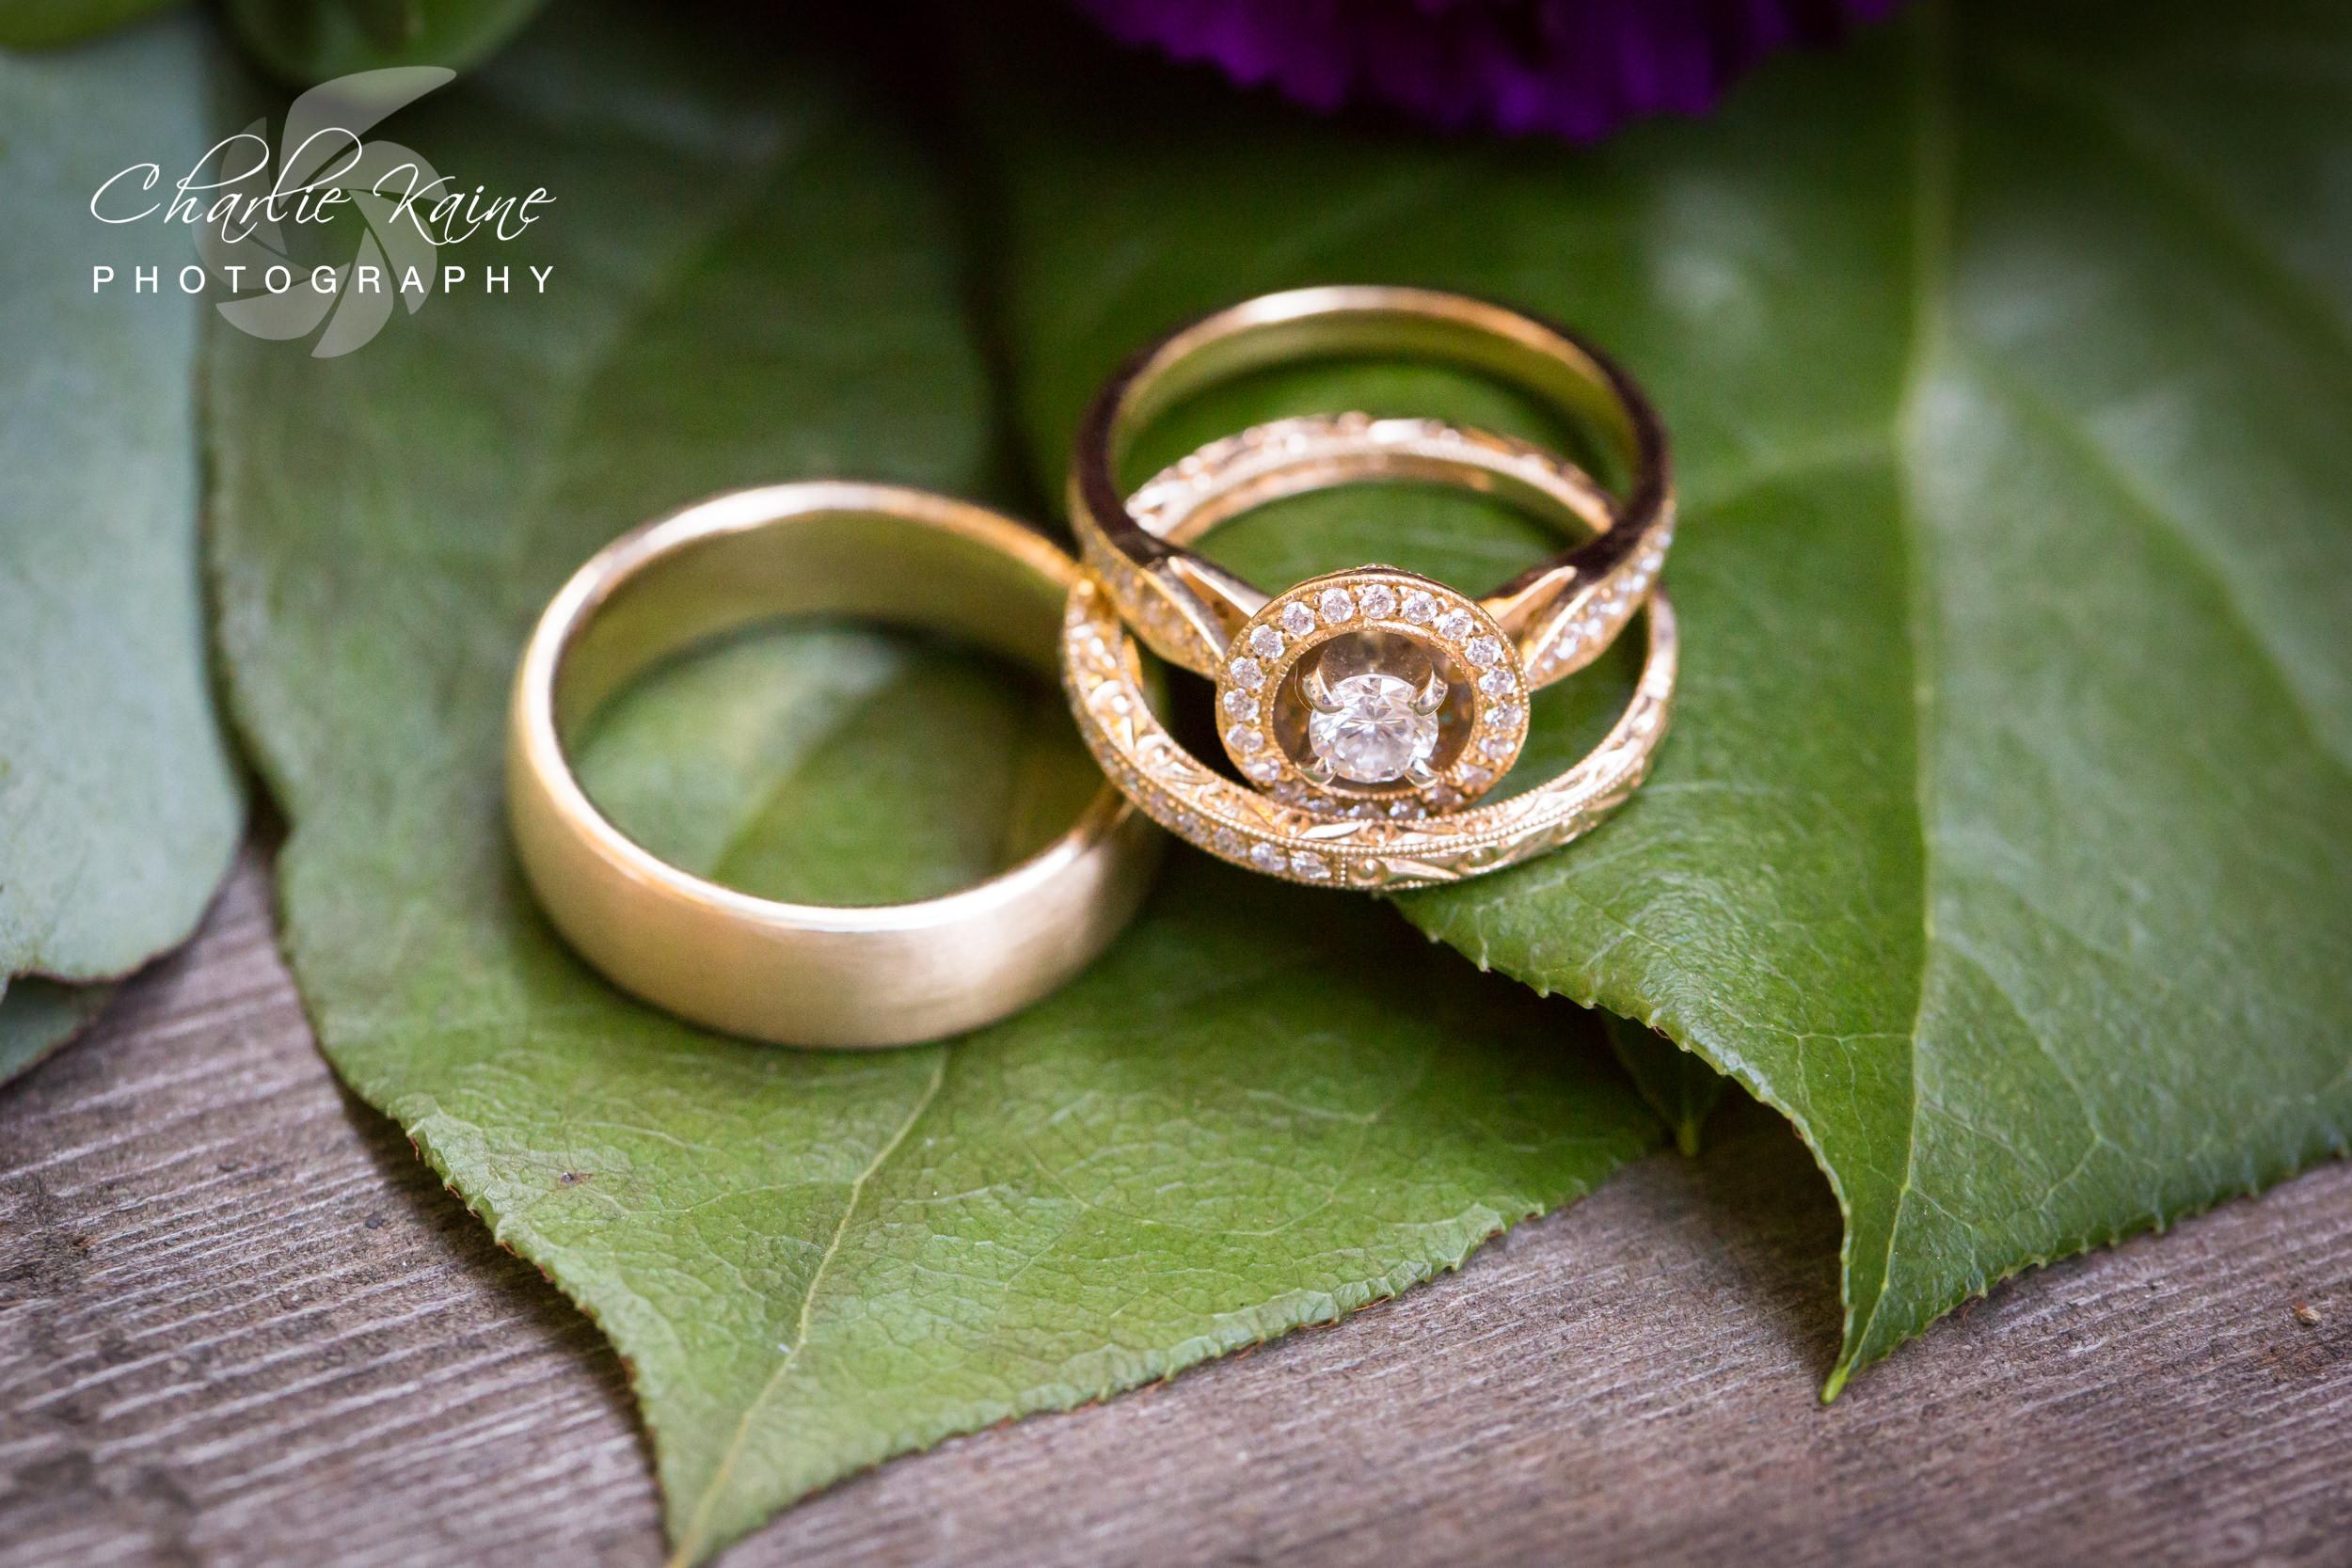 Charlie Kaine Photographer | San Francisco Wedding Photographer